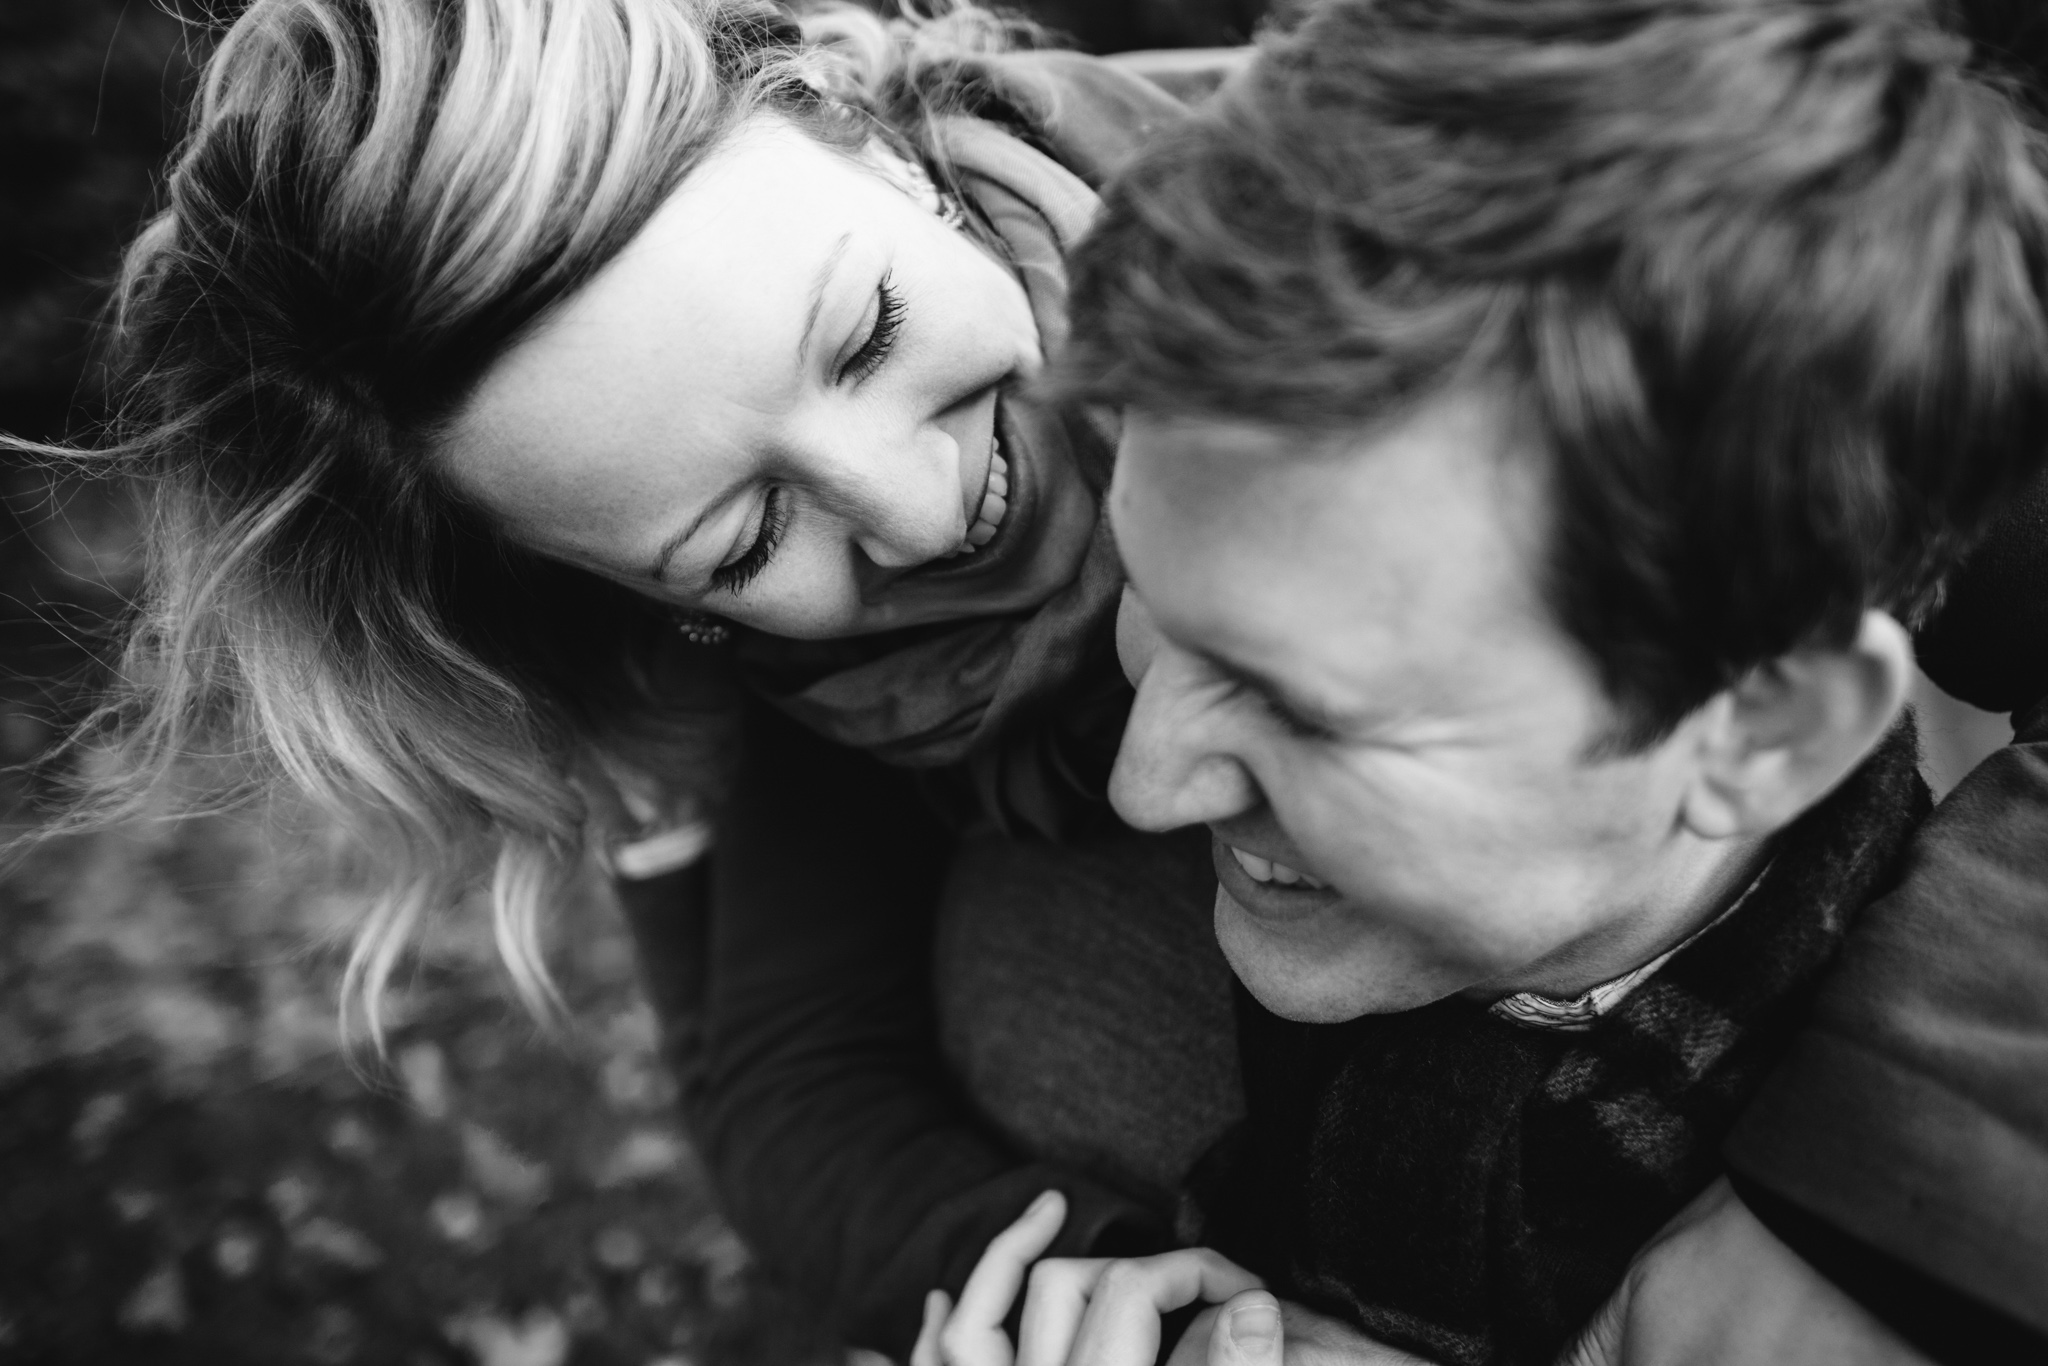 derbyshire-wedding-photographer-camera-hannah-14.jpg